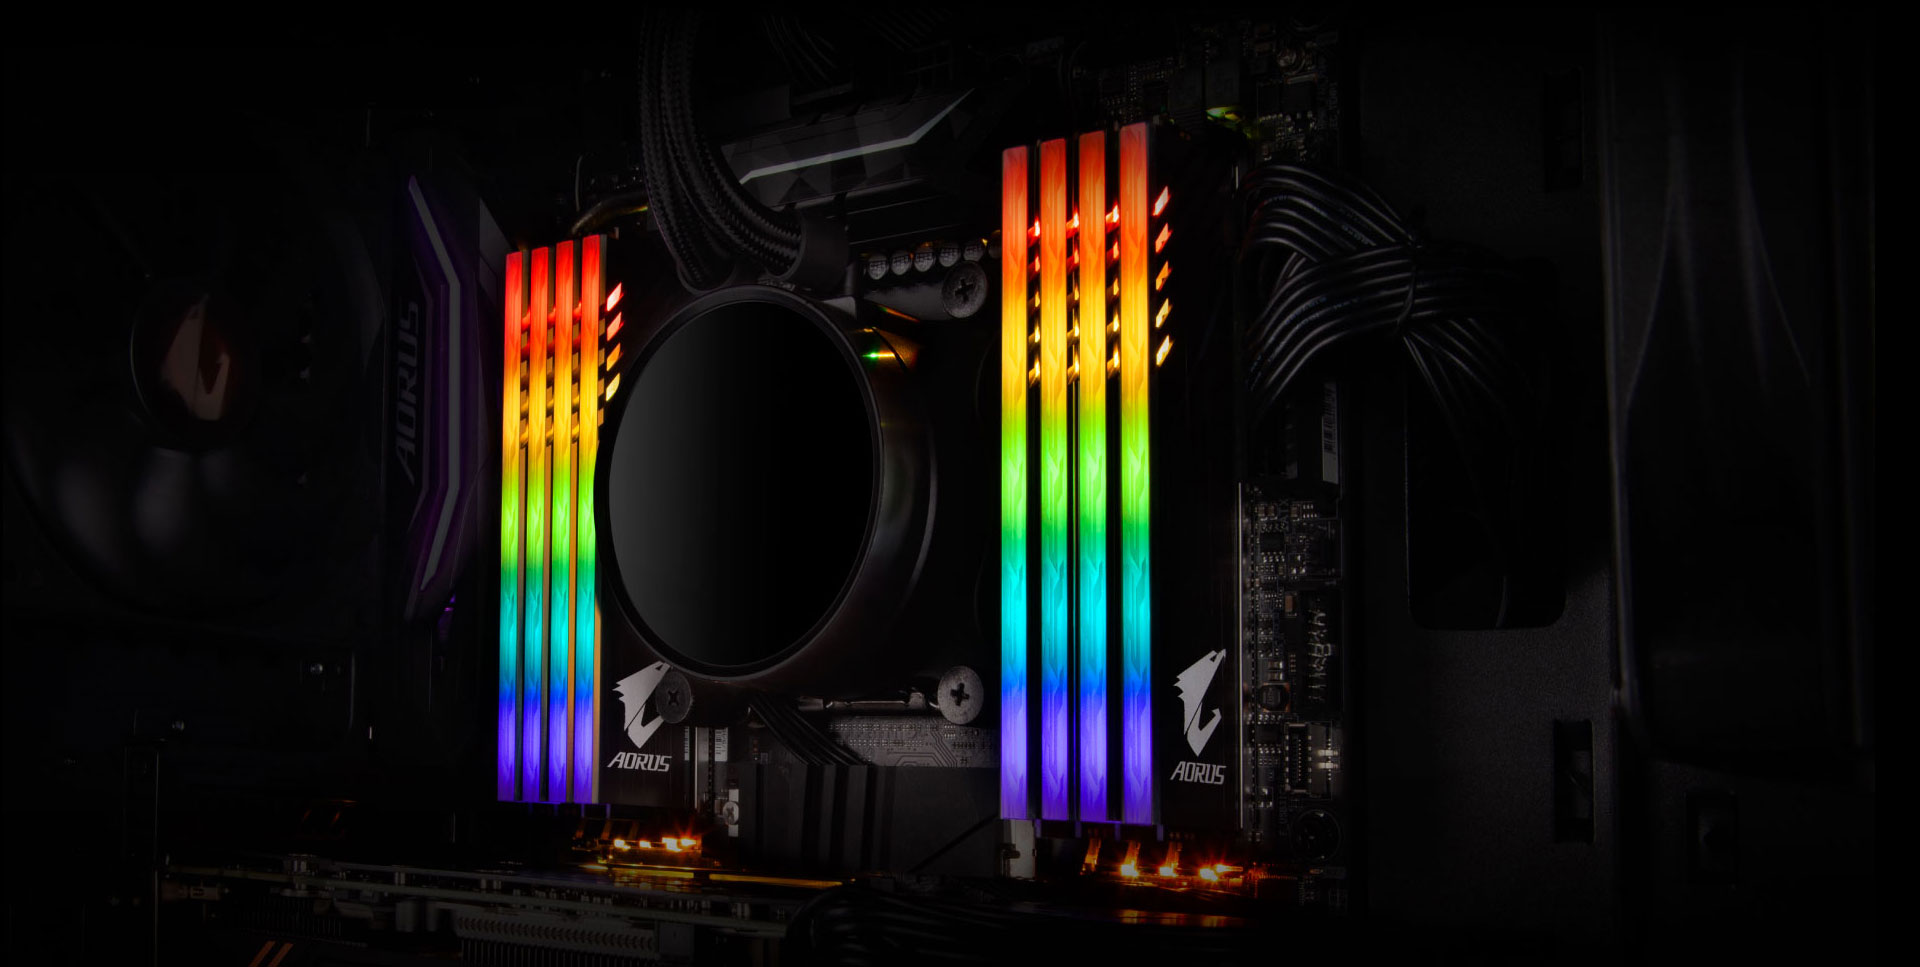 Обзор GIGABYTE AORUS RGB 16GB DDR4 Kit 3200 CL16 (2x8GB